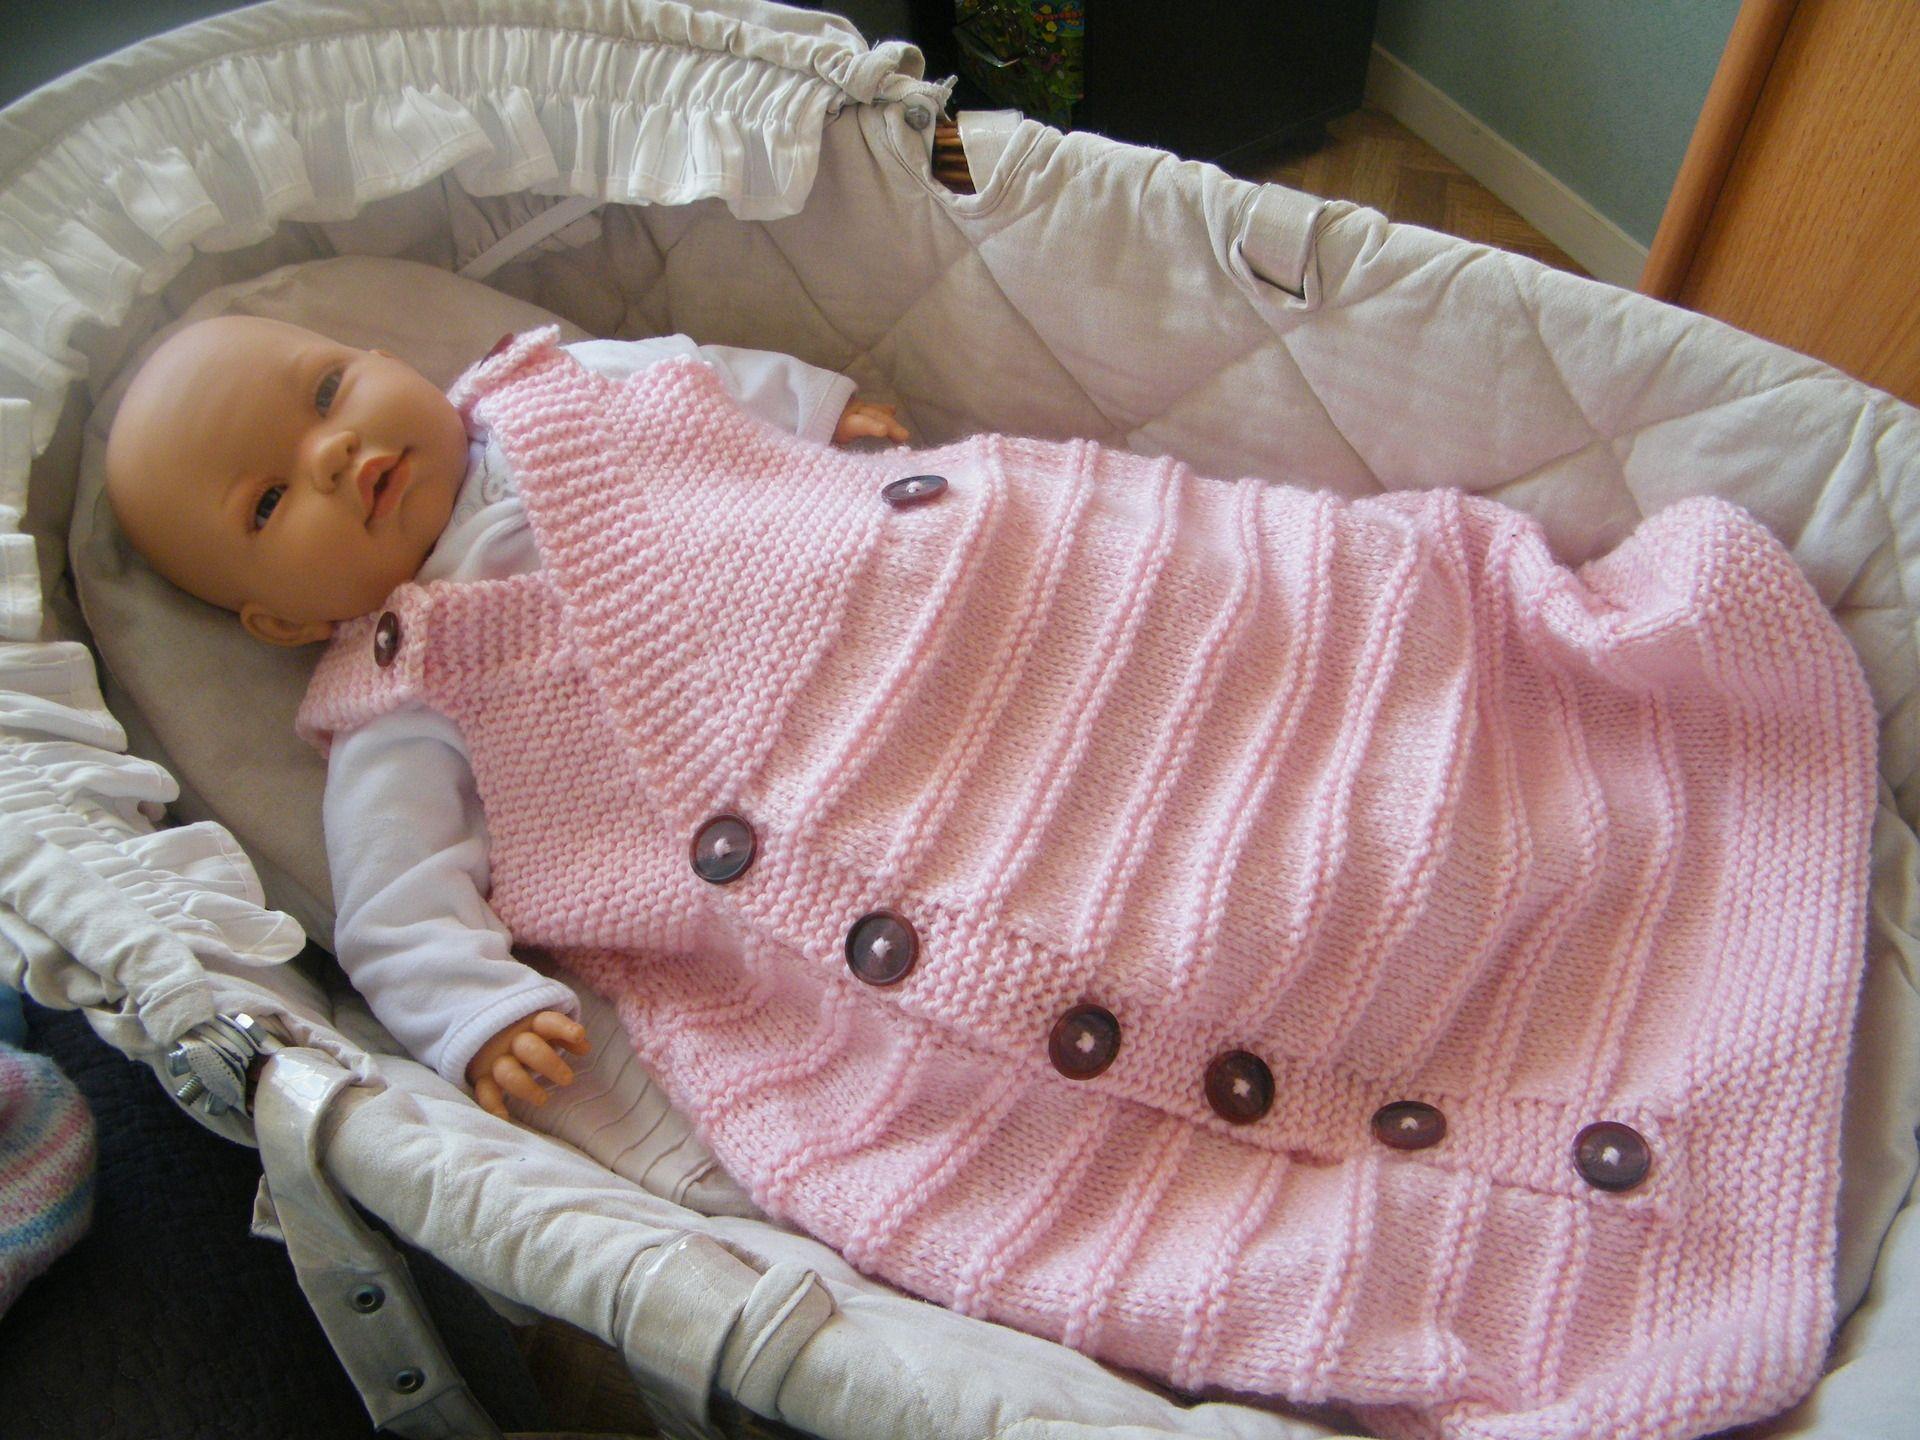 gigoteuse turbulette nidange tricot laine rose 0 6 mois mode pour b b pinterest. Black Bedroom Furniture Sets. Home Design Ideas